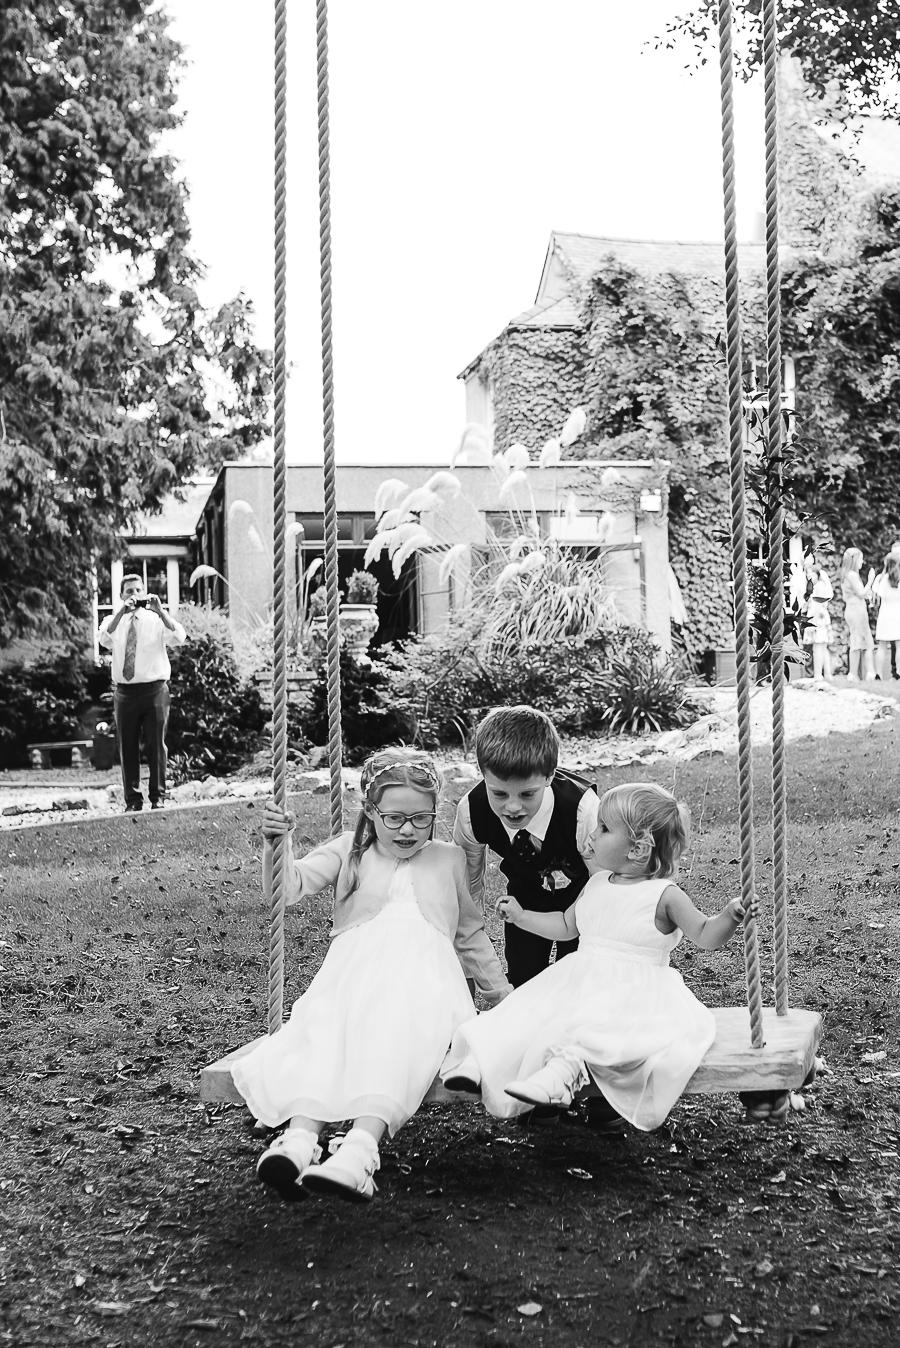 OurBeautifulAdventure-FairyhillWedding-John&Zoe-WeddingBlog-2-7.jpg